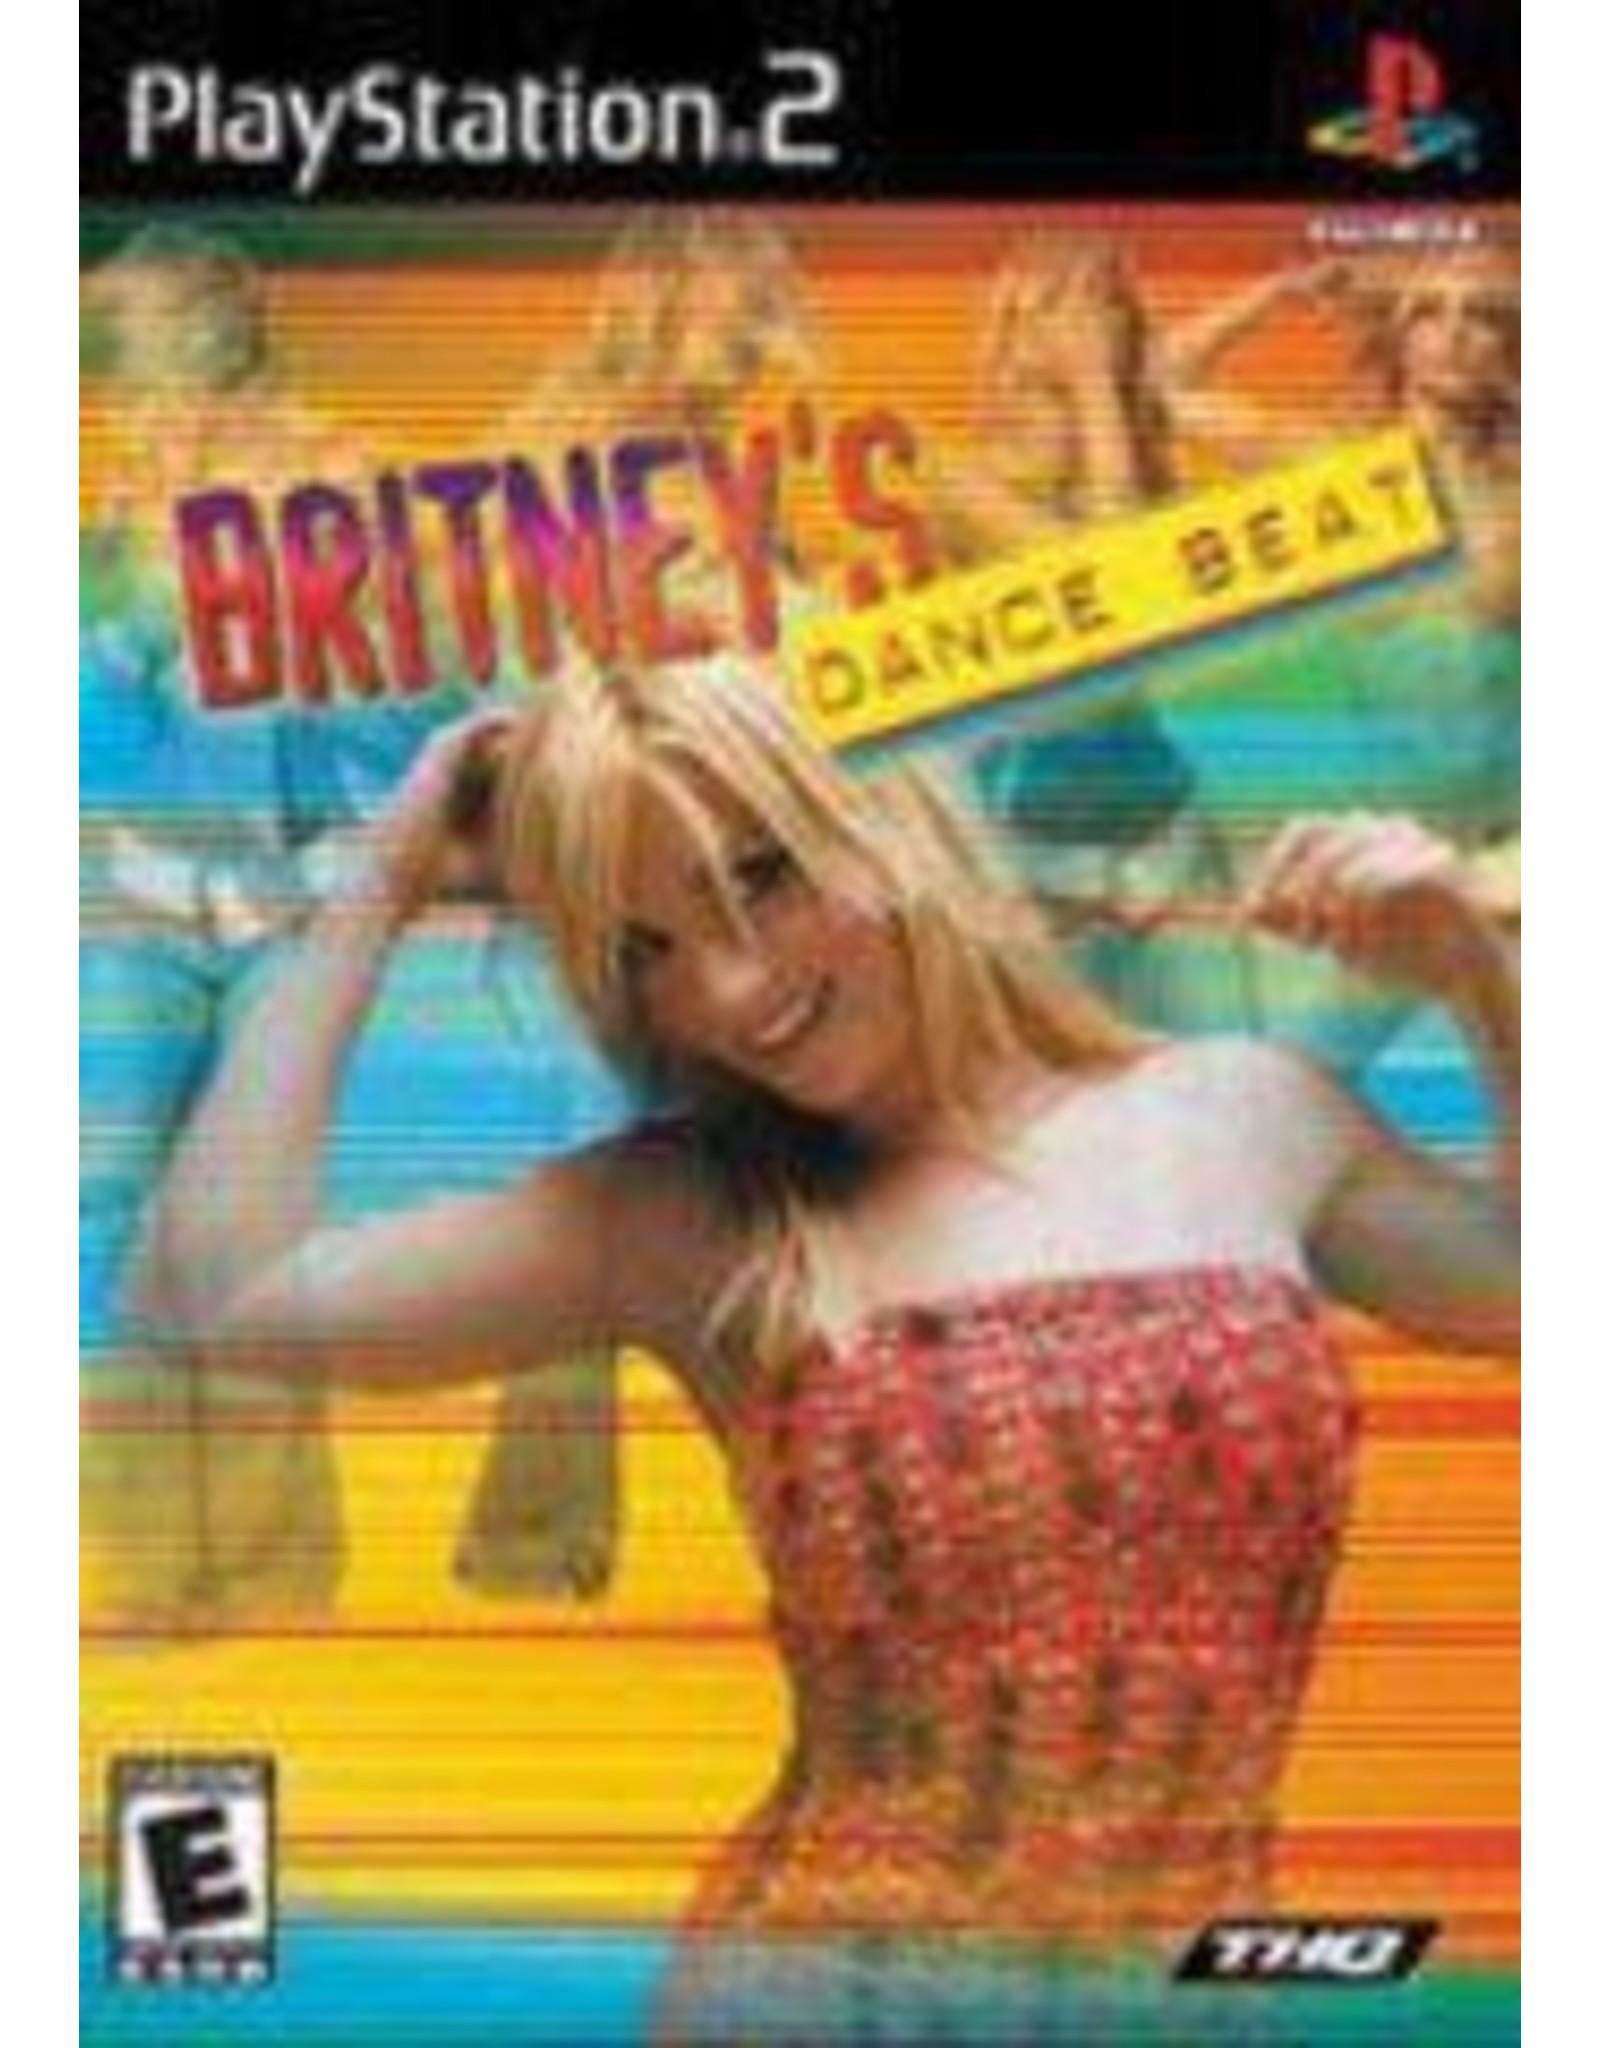 Playstation 2 Britney's Dance Beat (CiB)